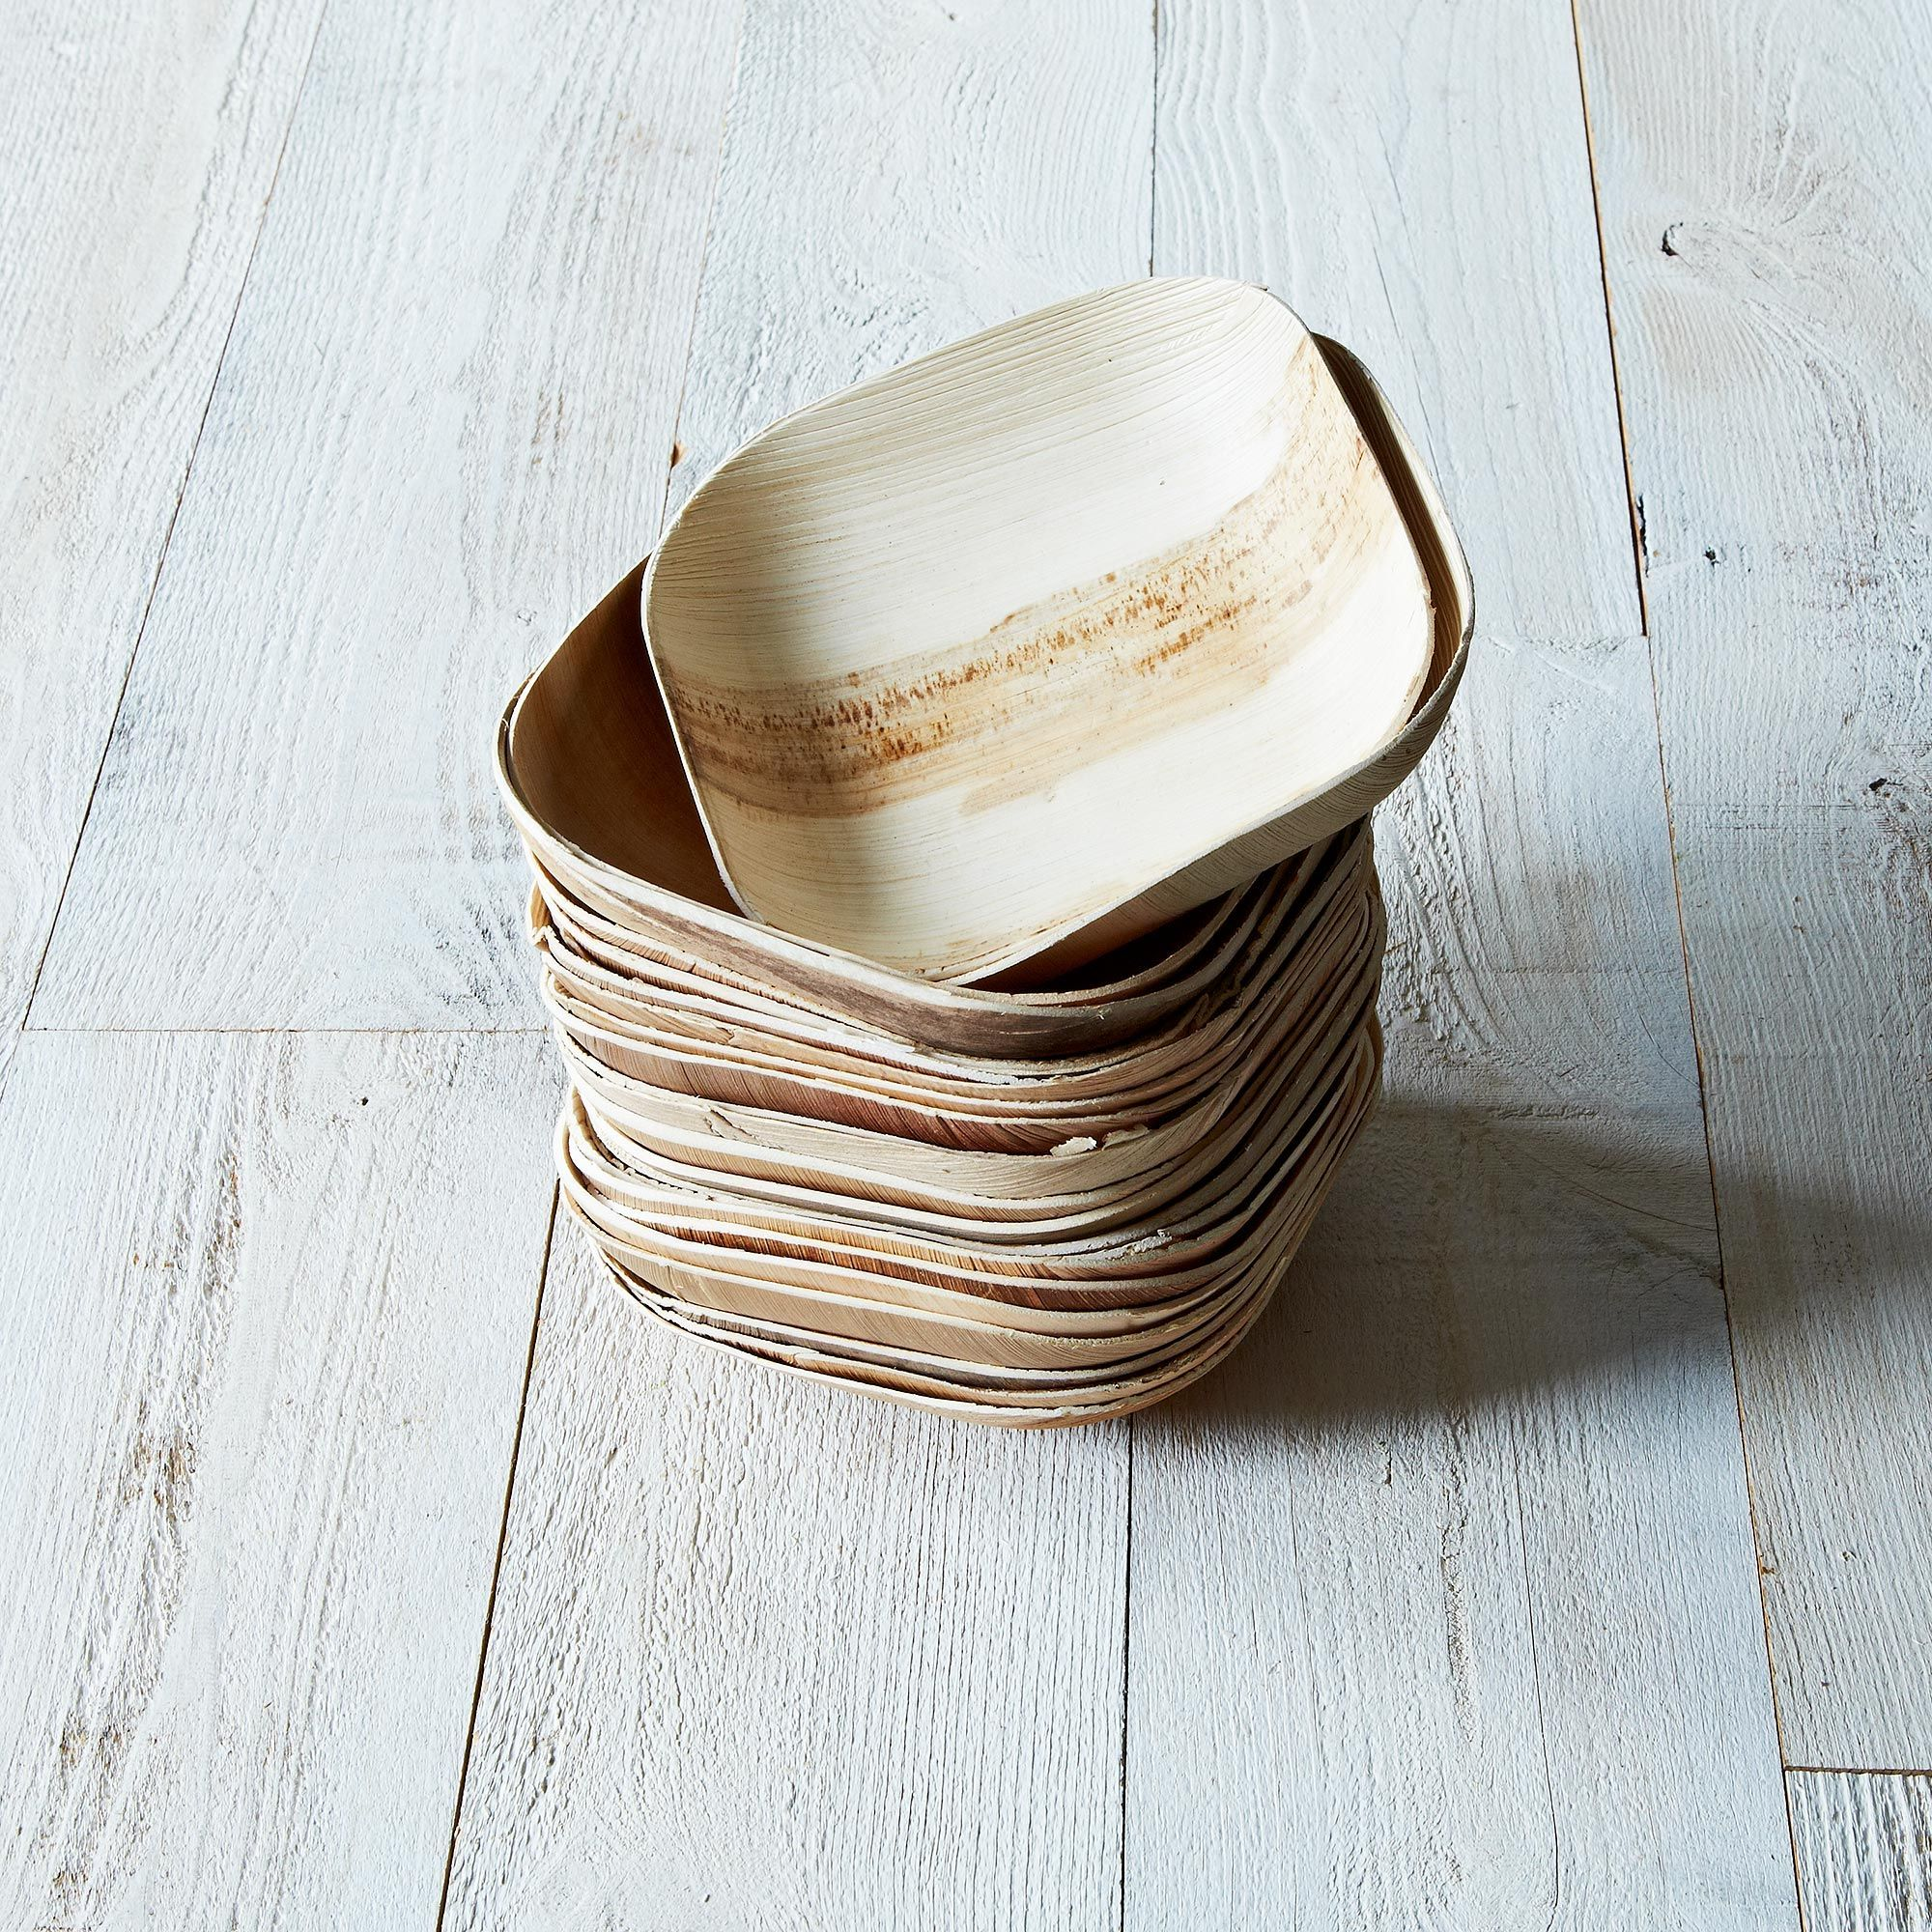 2a954960 a0f5 11e5 a190 0ef7535729df  2013 0711 verterra dinnerware from fallen leaves 6x6 bowls 010